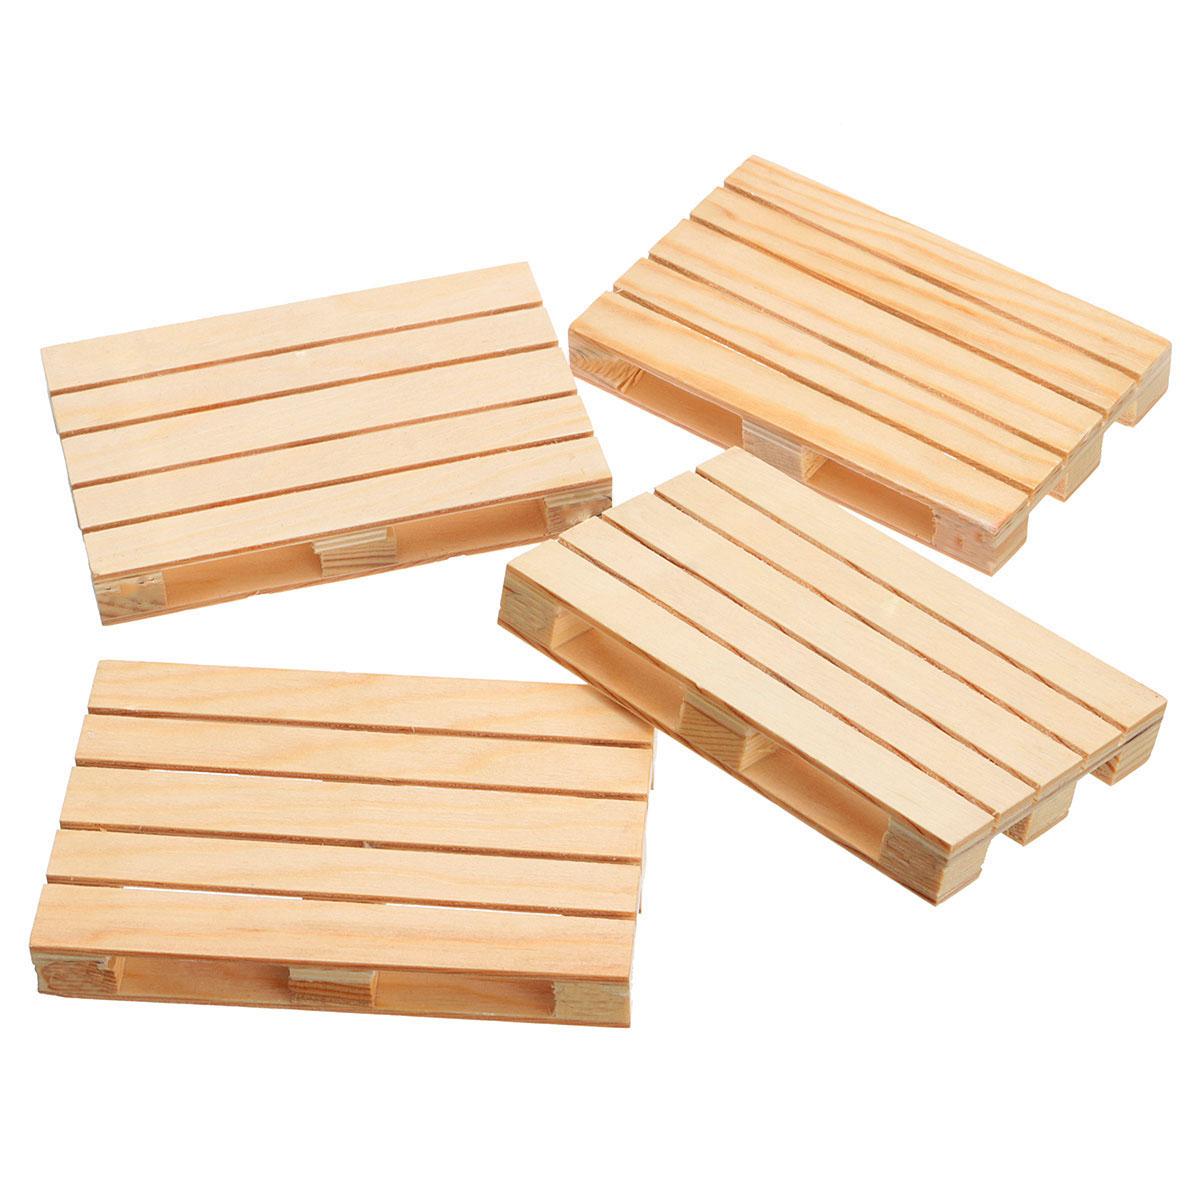 Set of 4 Beverage Wood Pallets Mini Wooden Pallet Coasters ...